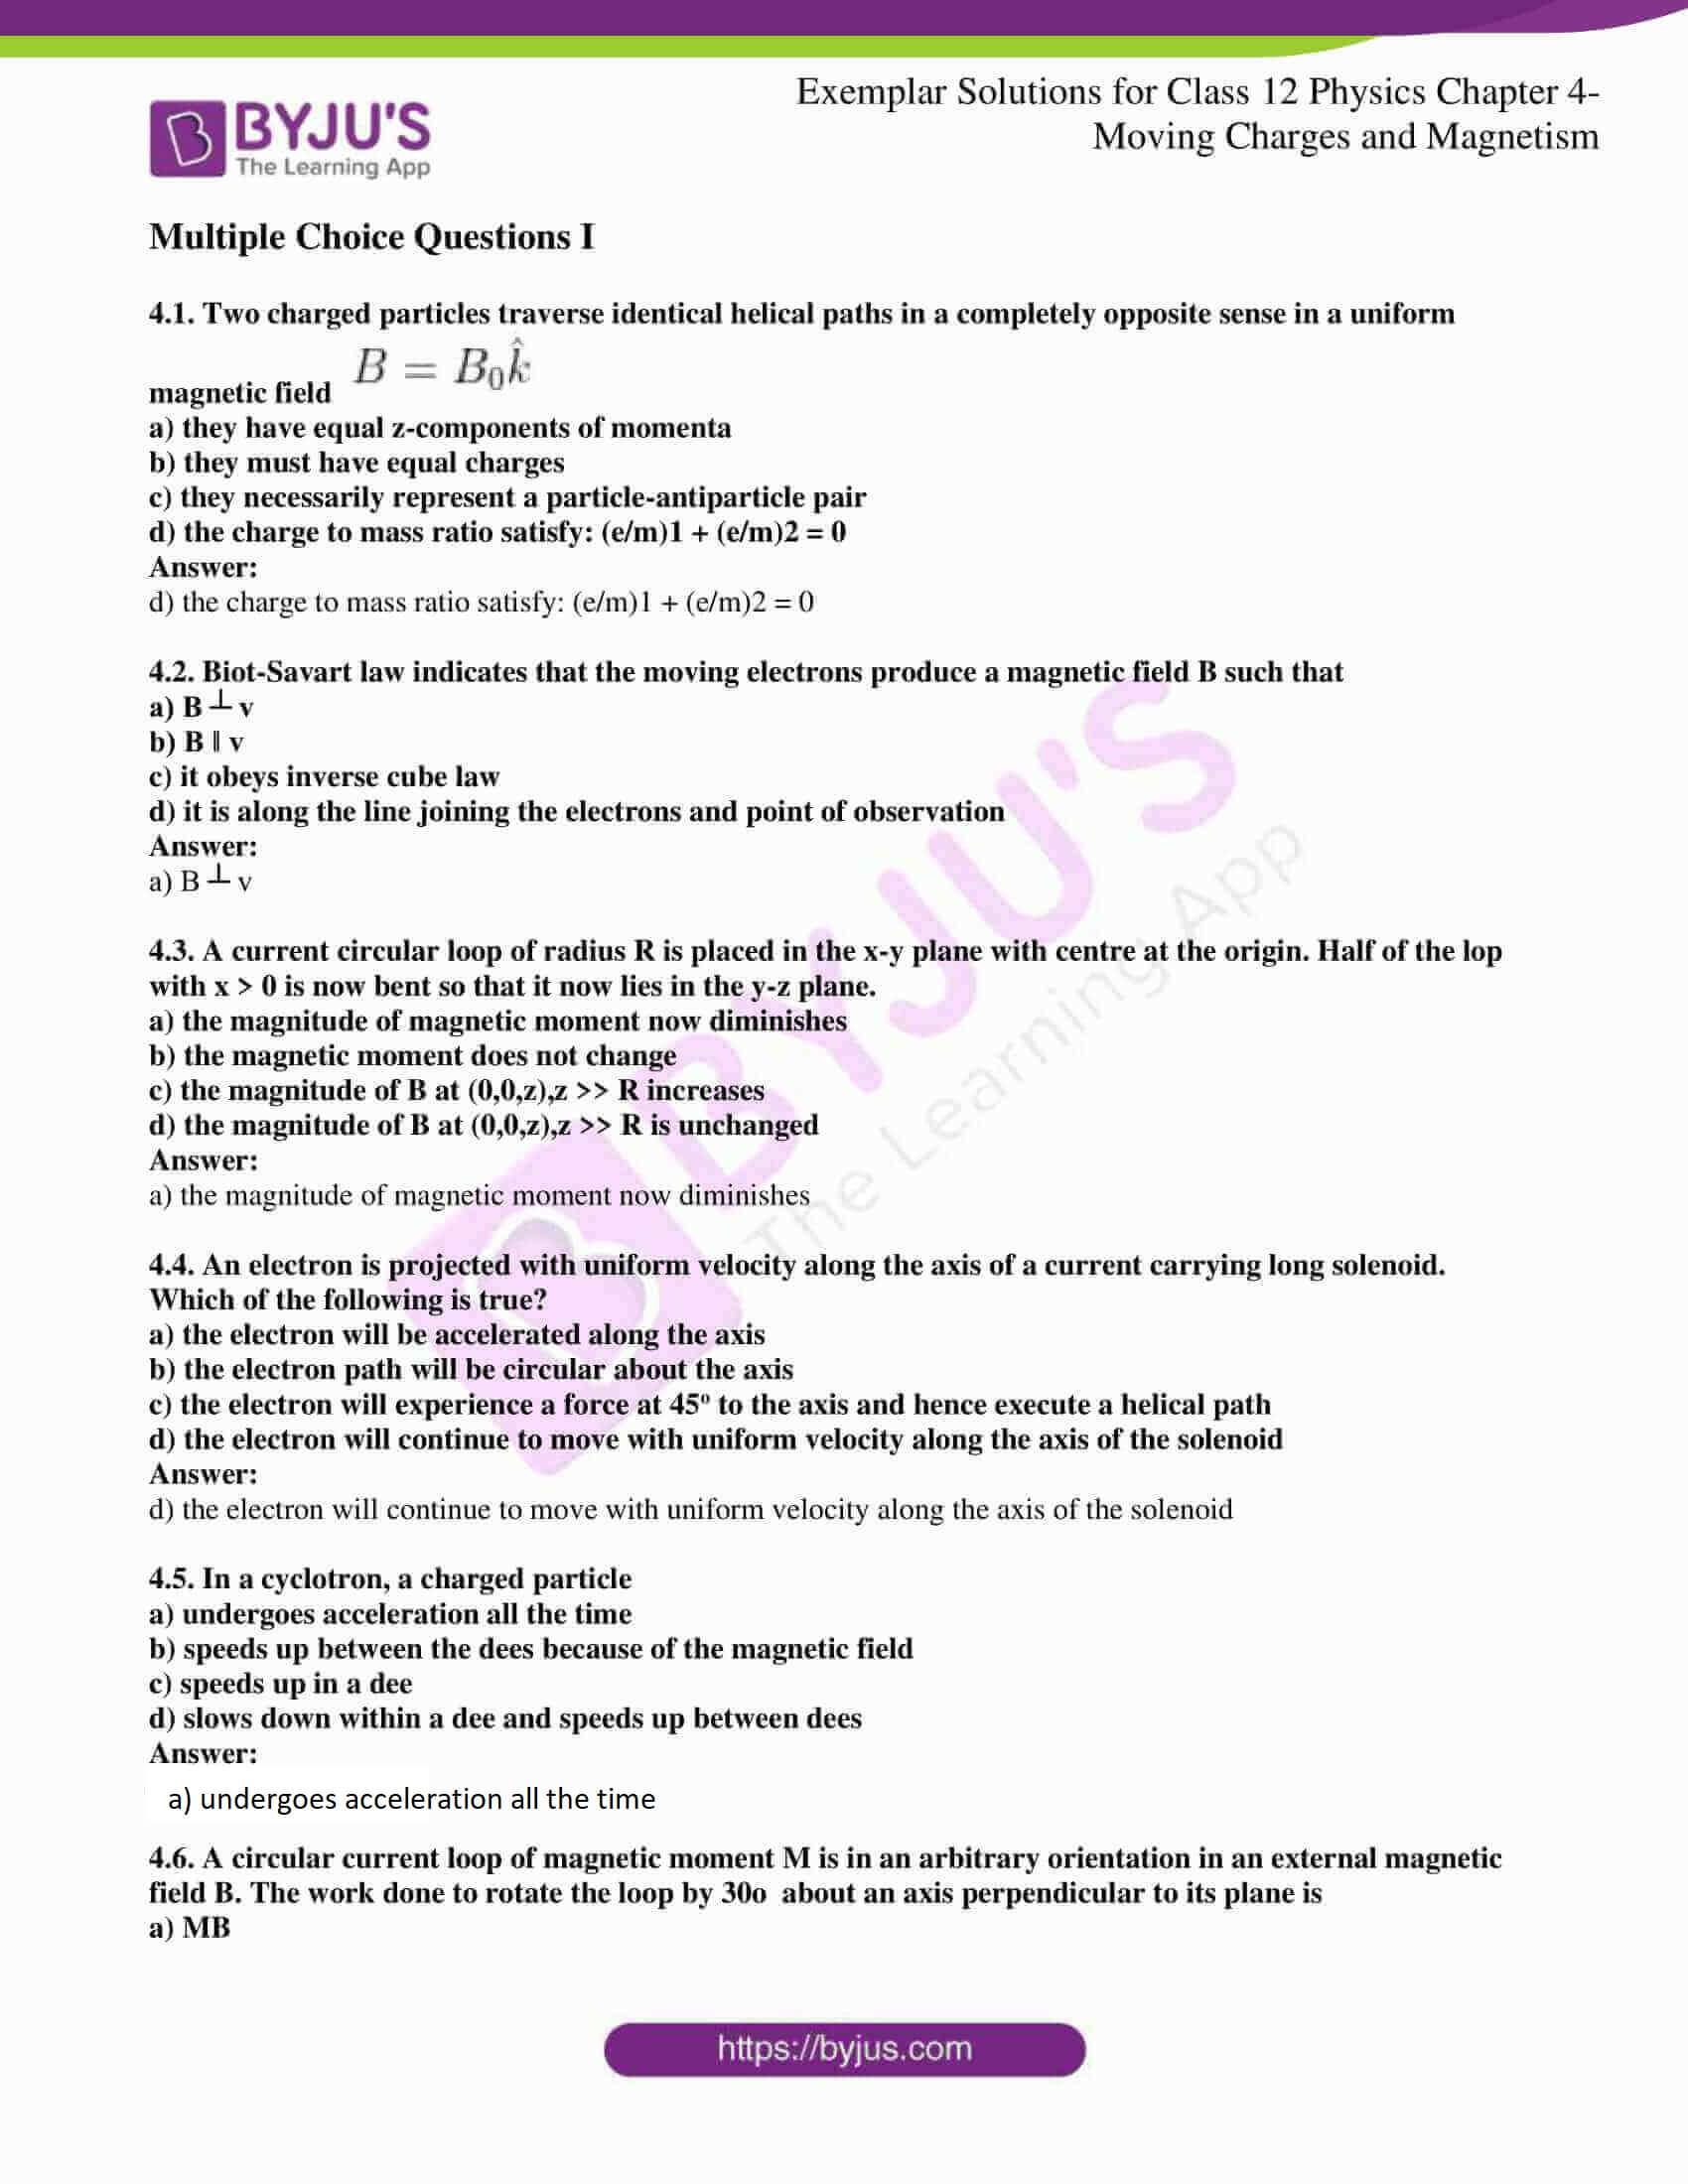 ncert exemplar solutions for class 12 physics chapter 4 01